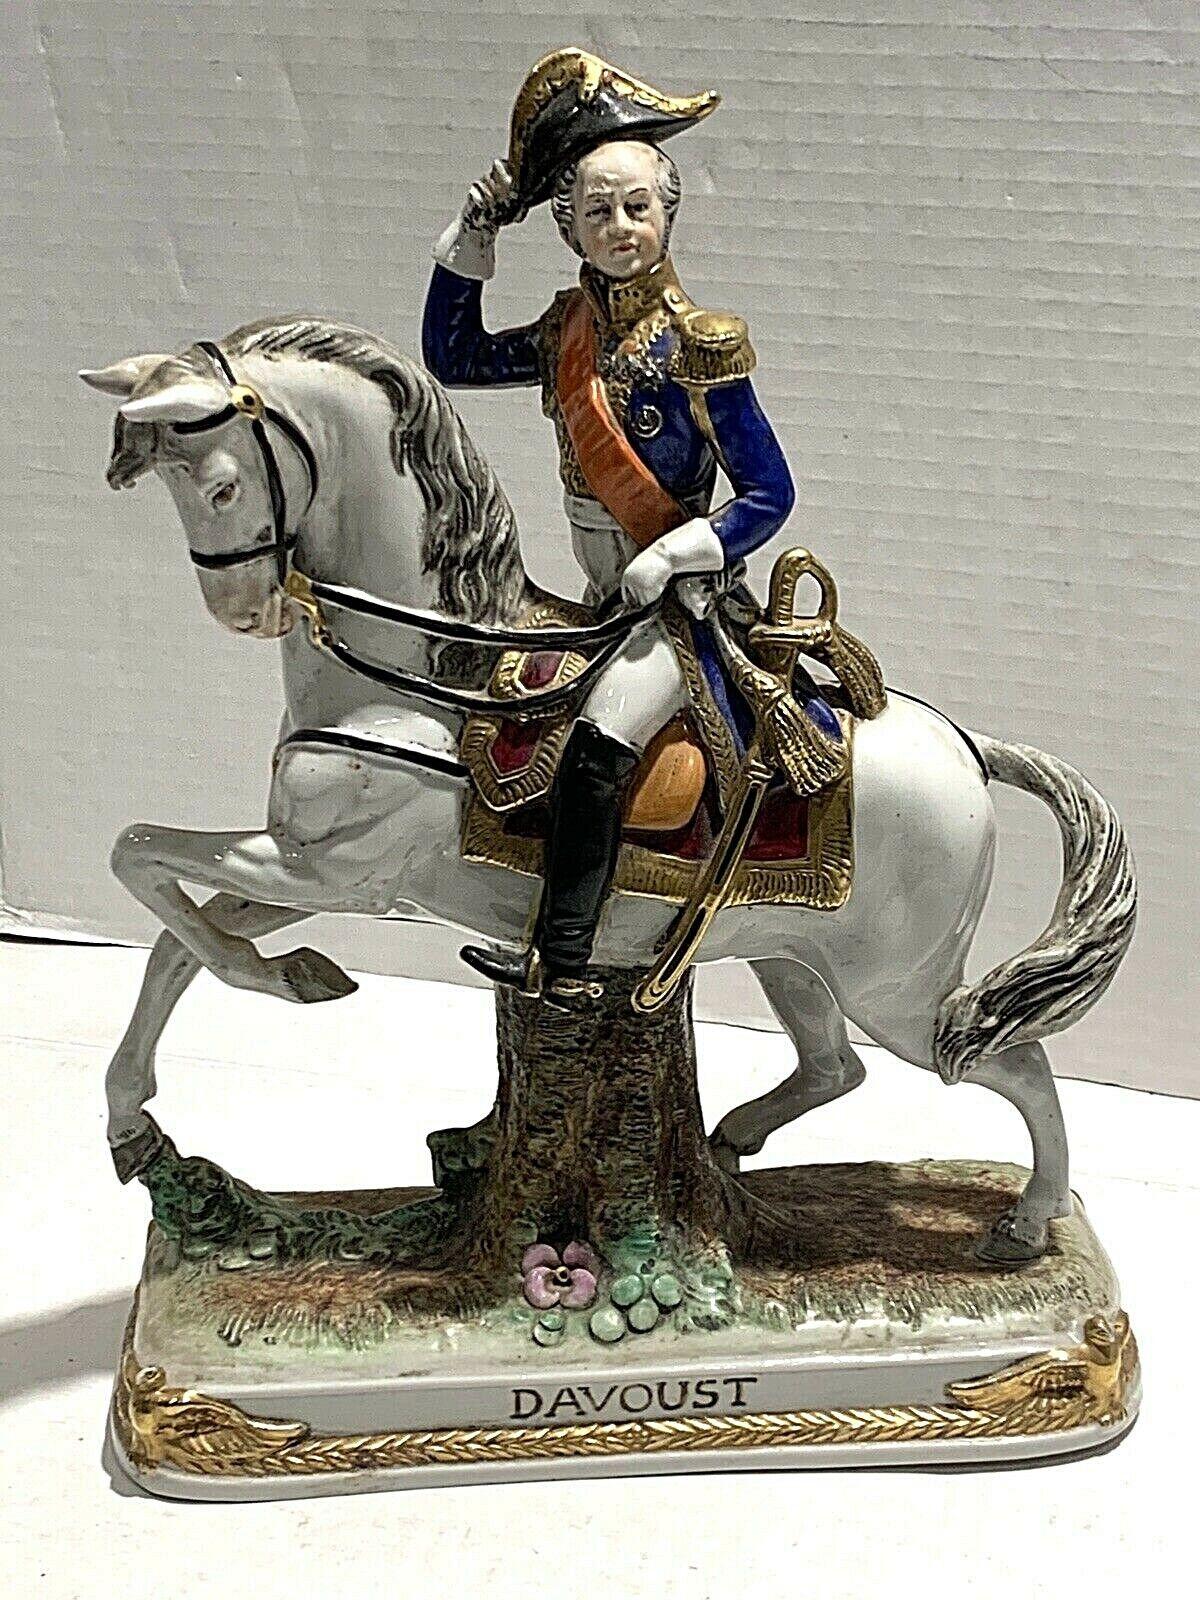 ANTIQUE GERMAN PORCELAIN FIGURINE OF DAVOUST ON A HORSE - $150.00